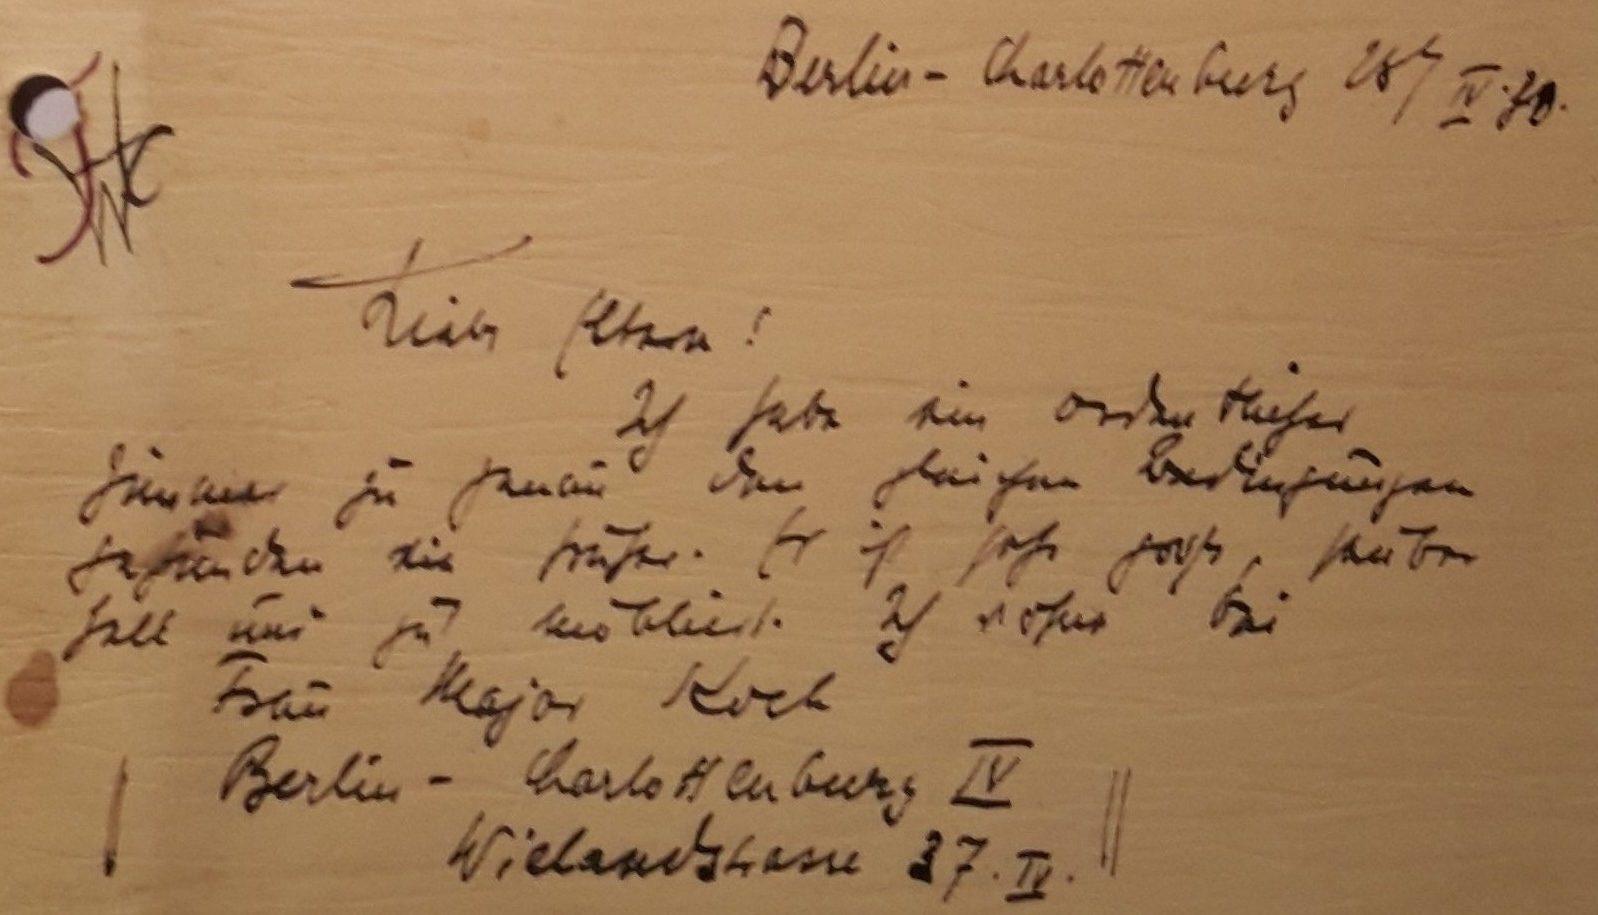 1932 - Briefe aus Berlin UA